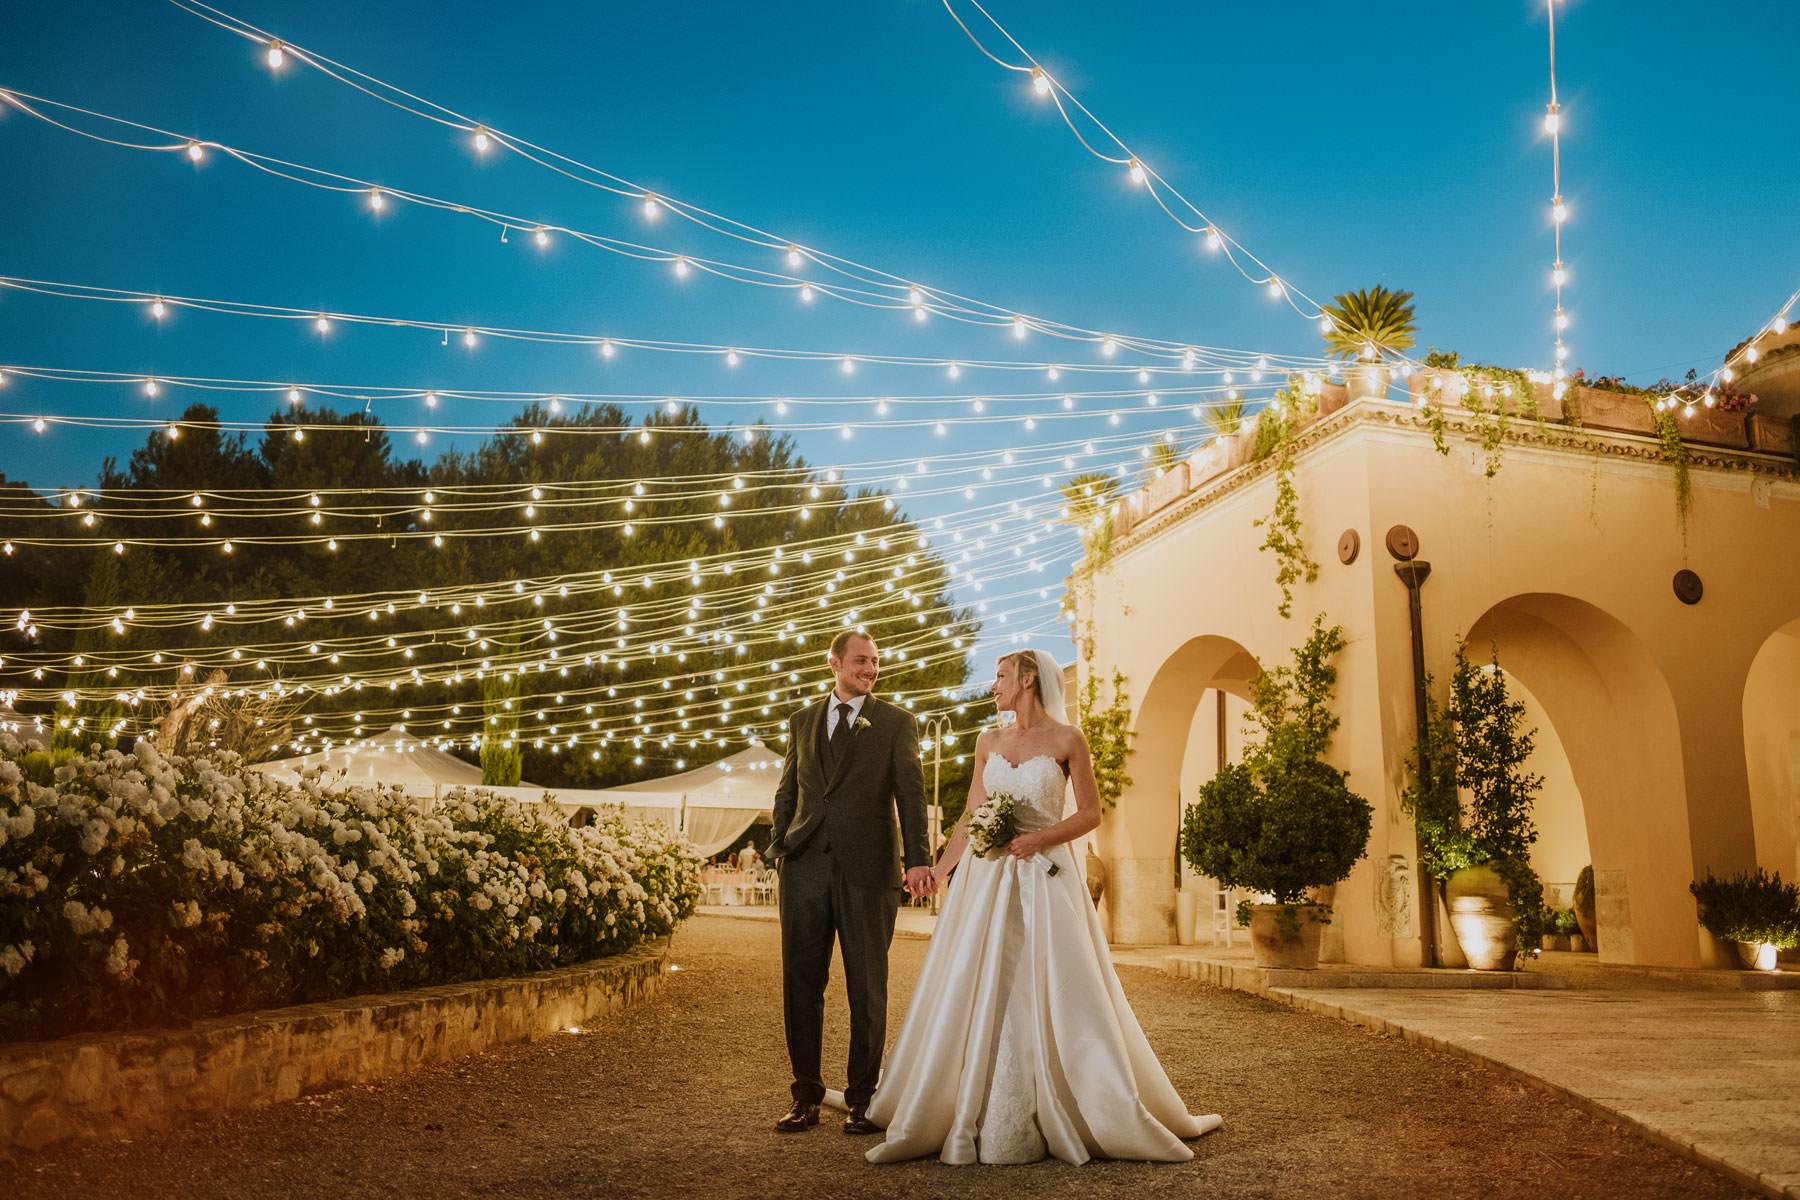 Fotografia serale di sposi a Masseria Pietrafitta di Foggia